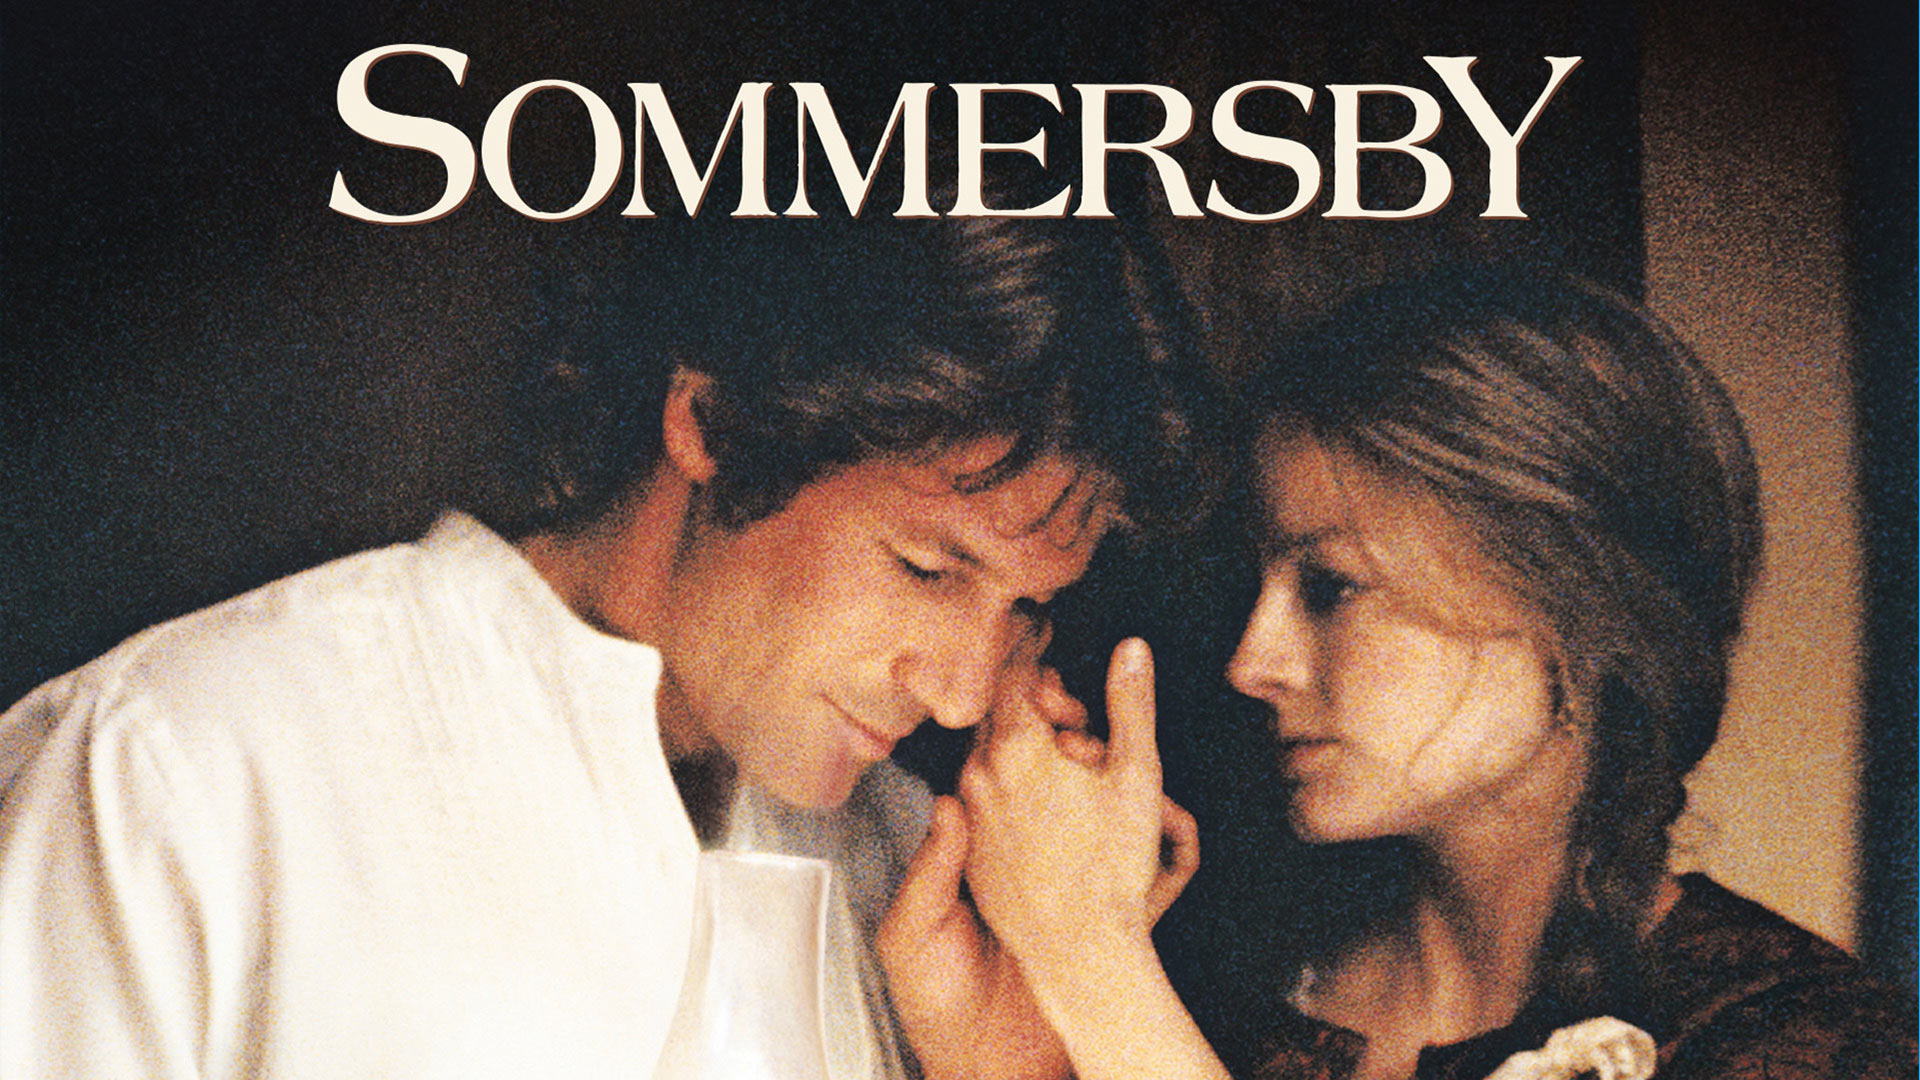 Sommersby (字幕版)